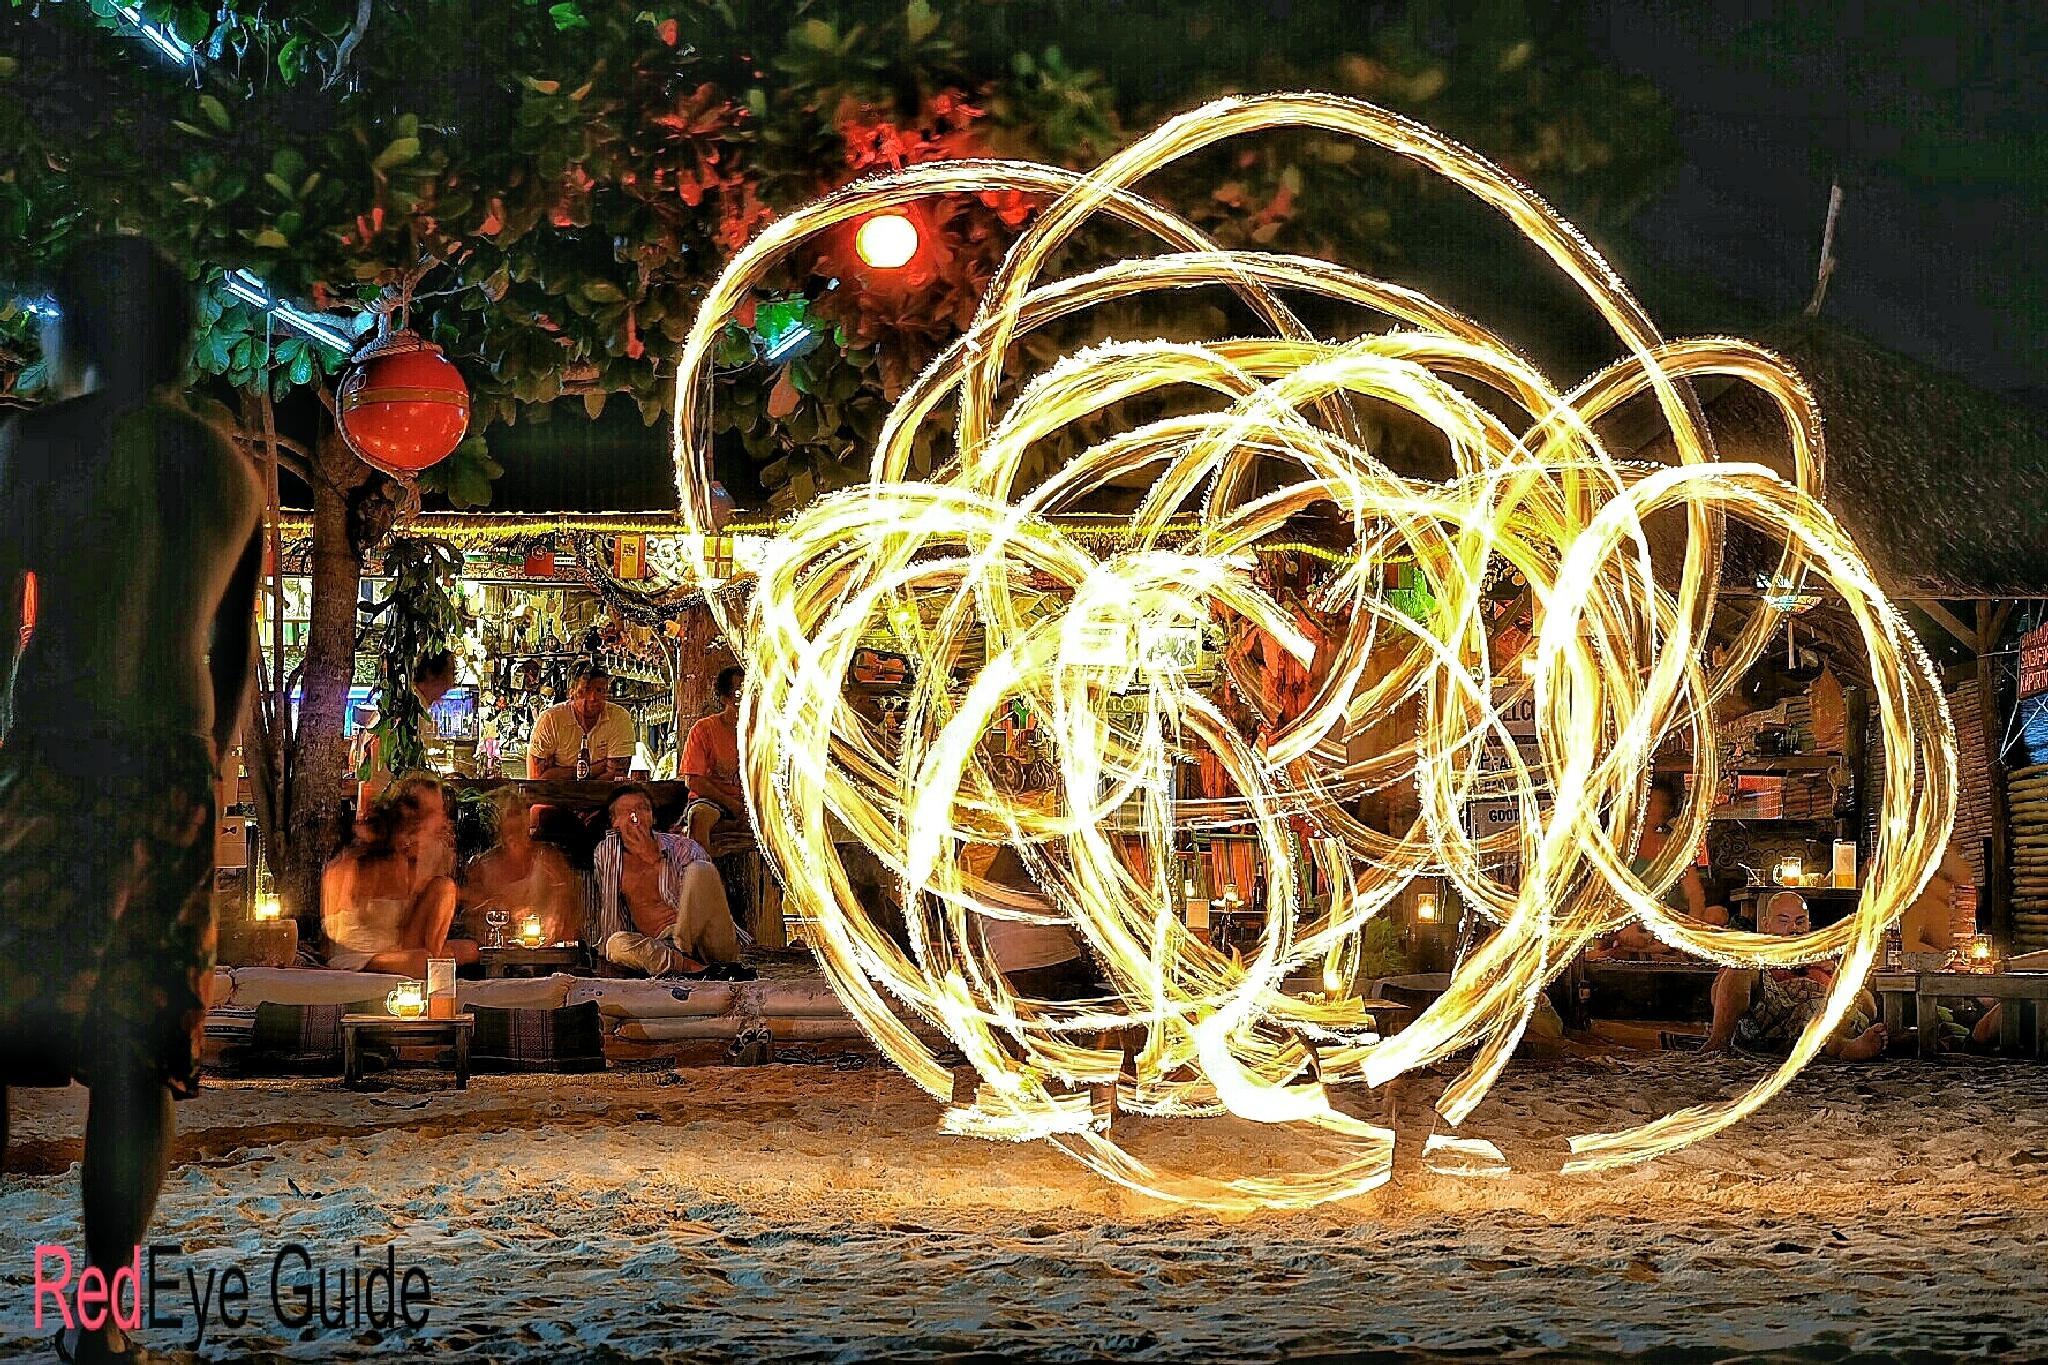 Fire Dance #2 by Kapten Redeye